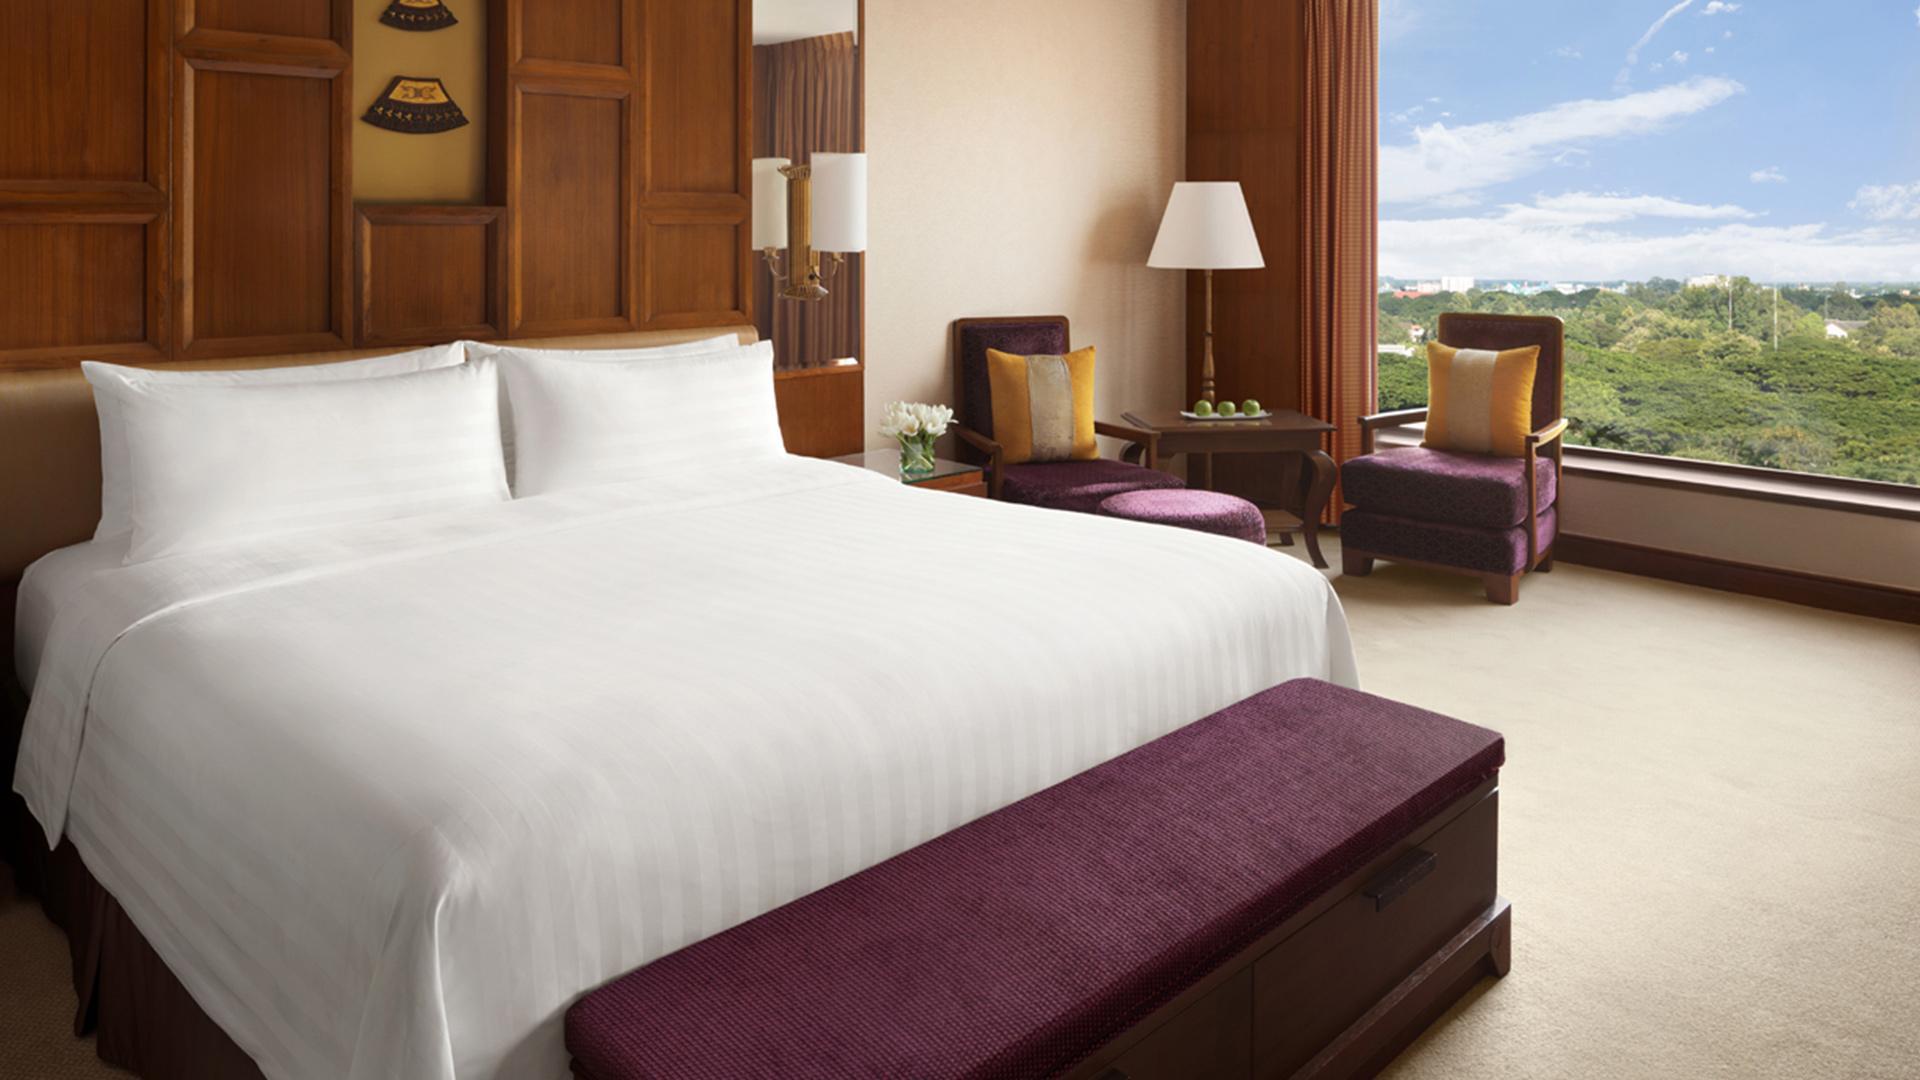 Deluxe King/Twin Room image 1 at Shangri-La Hotel, Chiang Mai by Amphoe Mueang Chiang Mai, Chang Wat Chiang Mai, Thailand